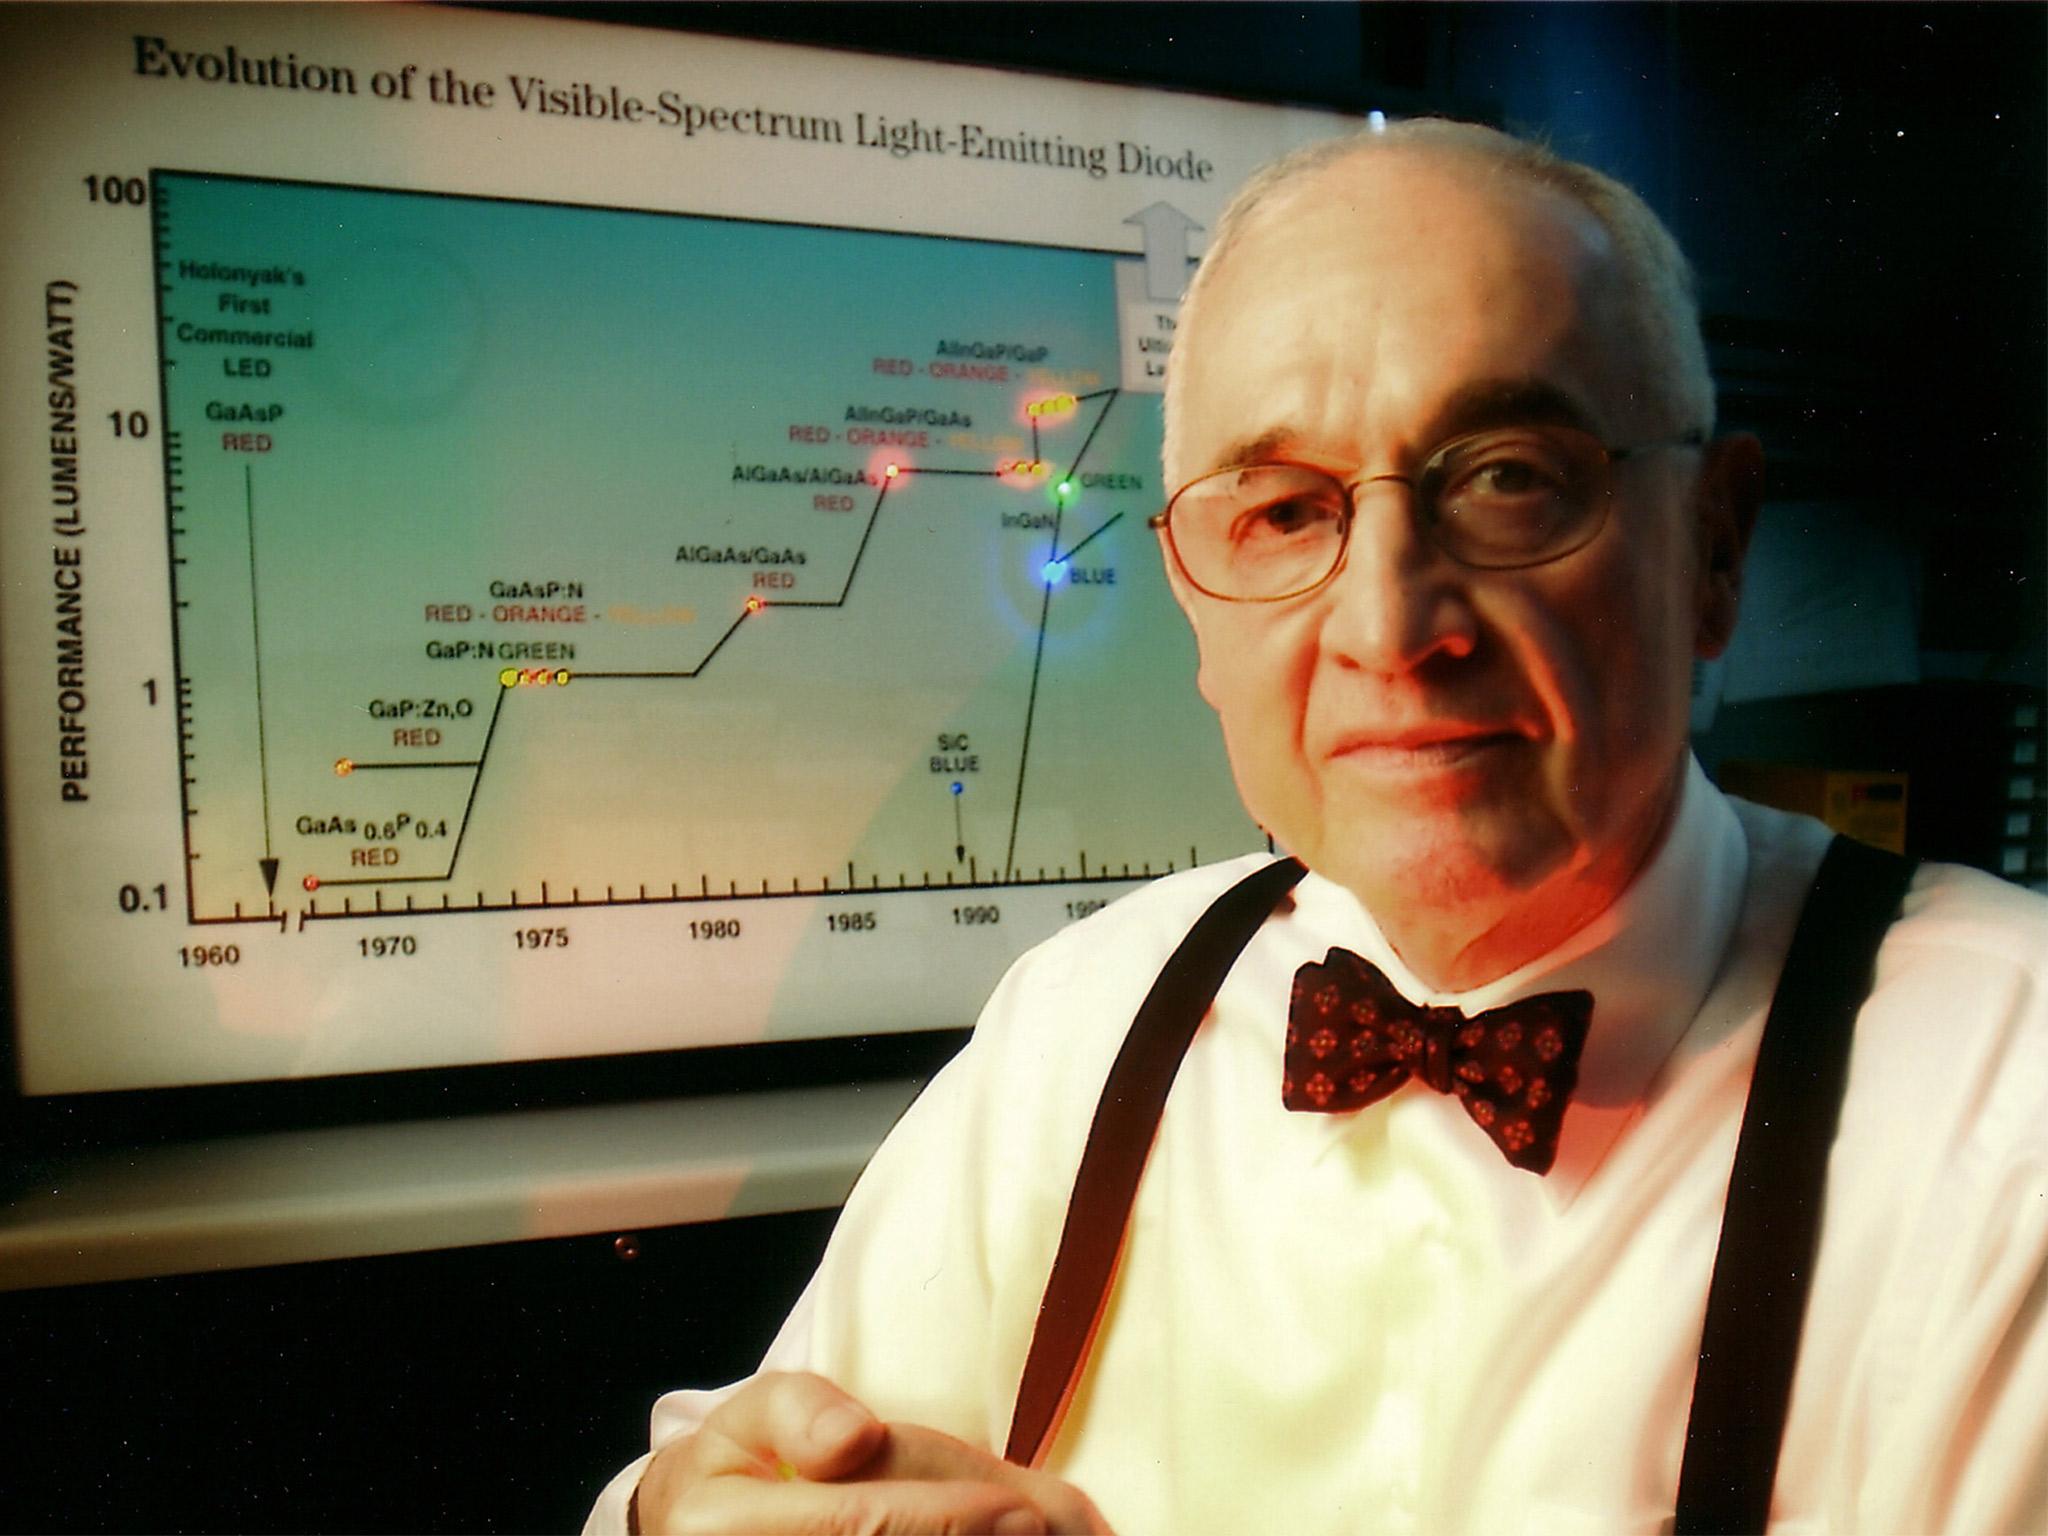 Nick Holonyak invented LED